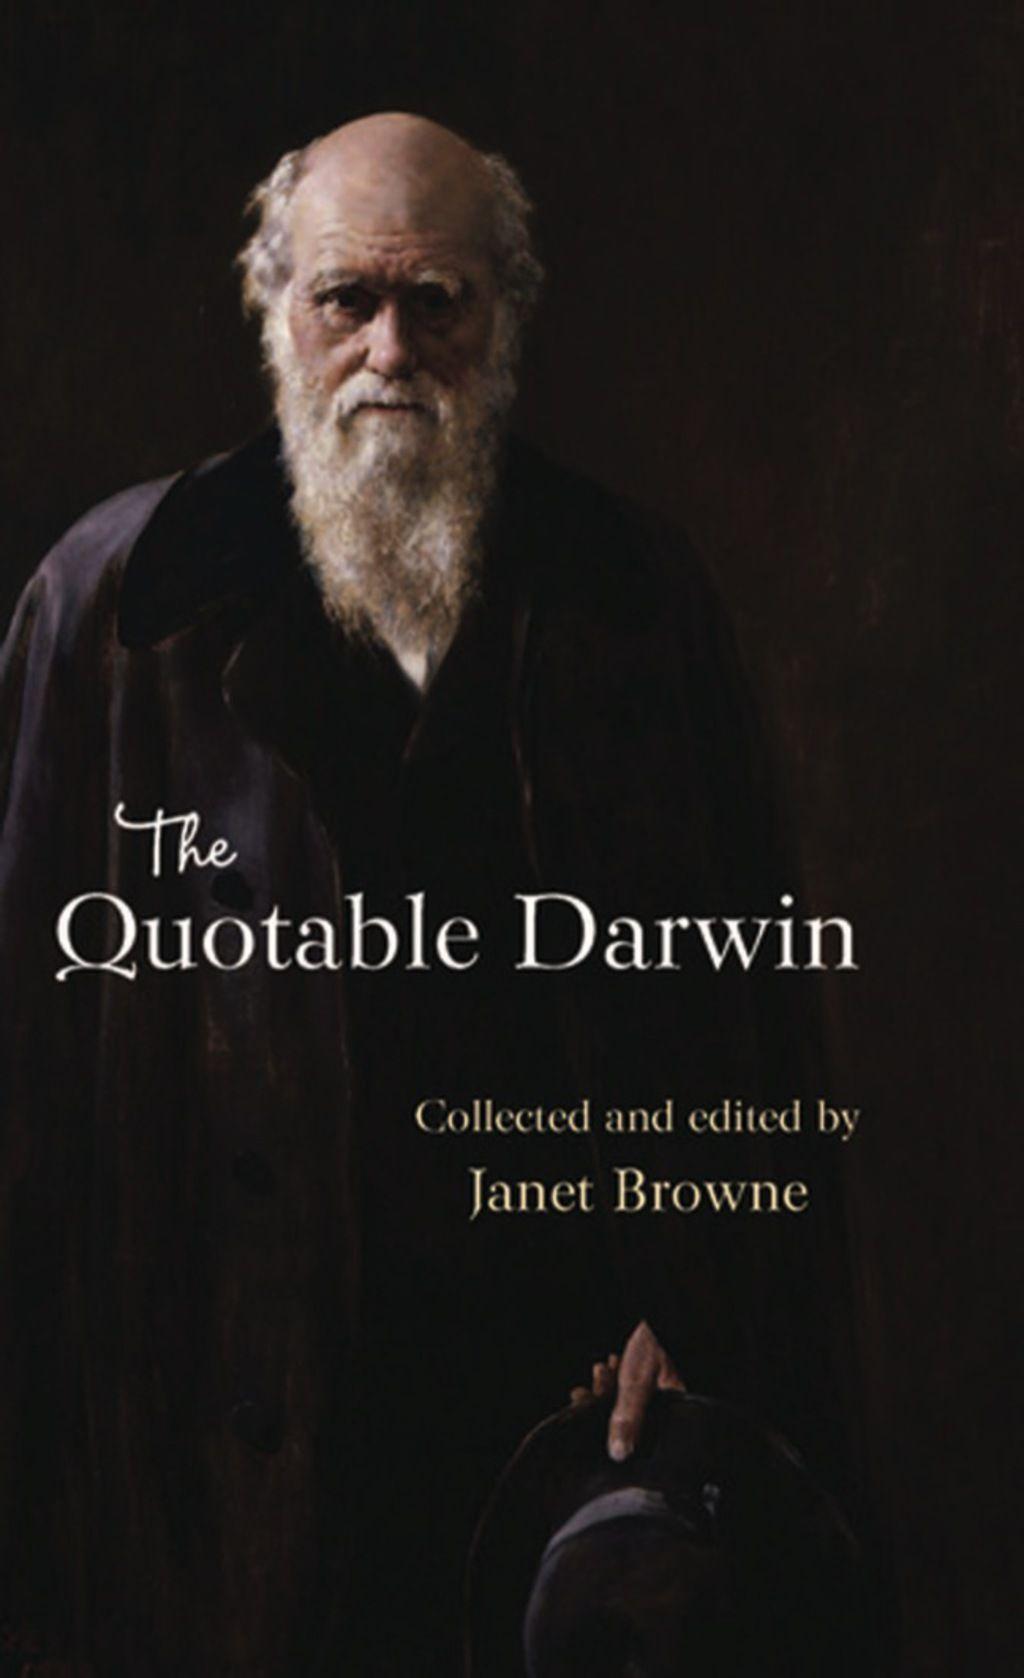 The Quotable Darwin Ebook